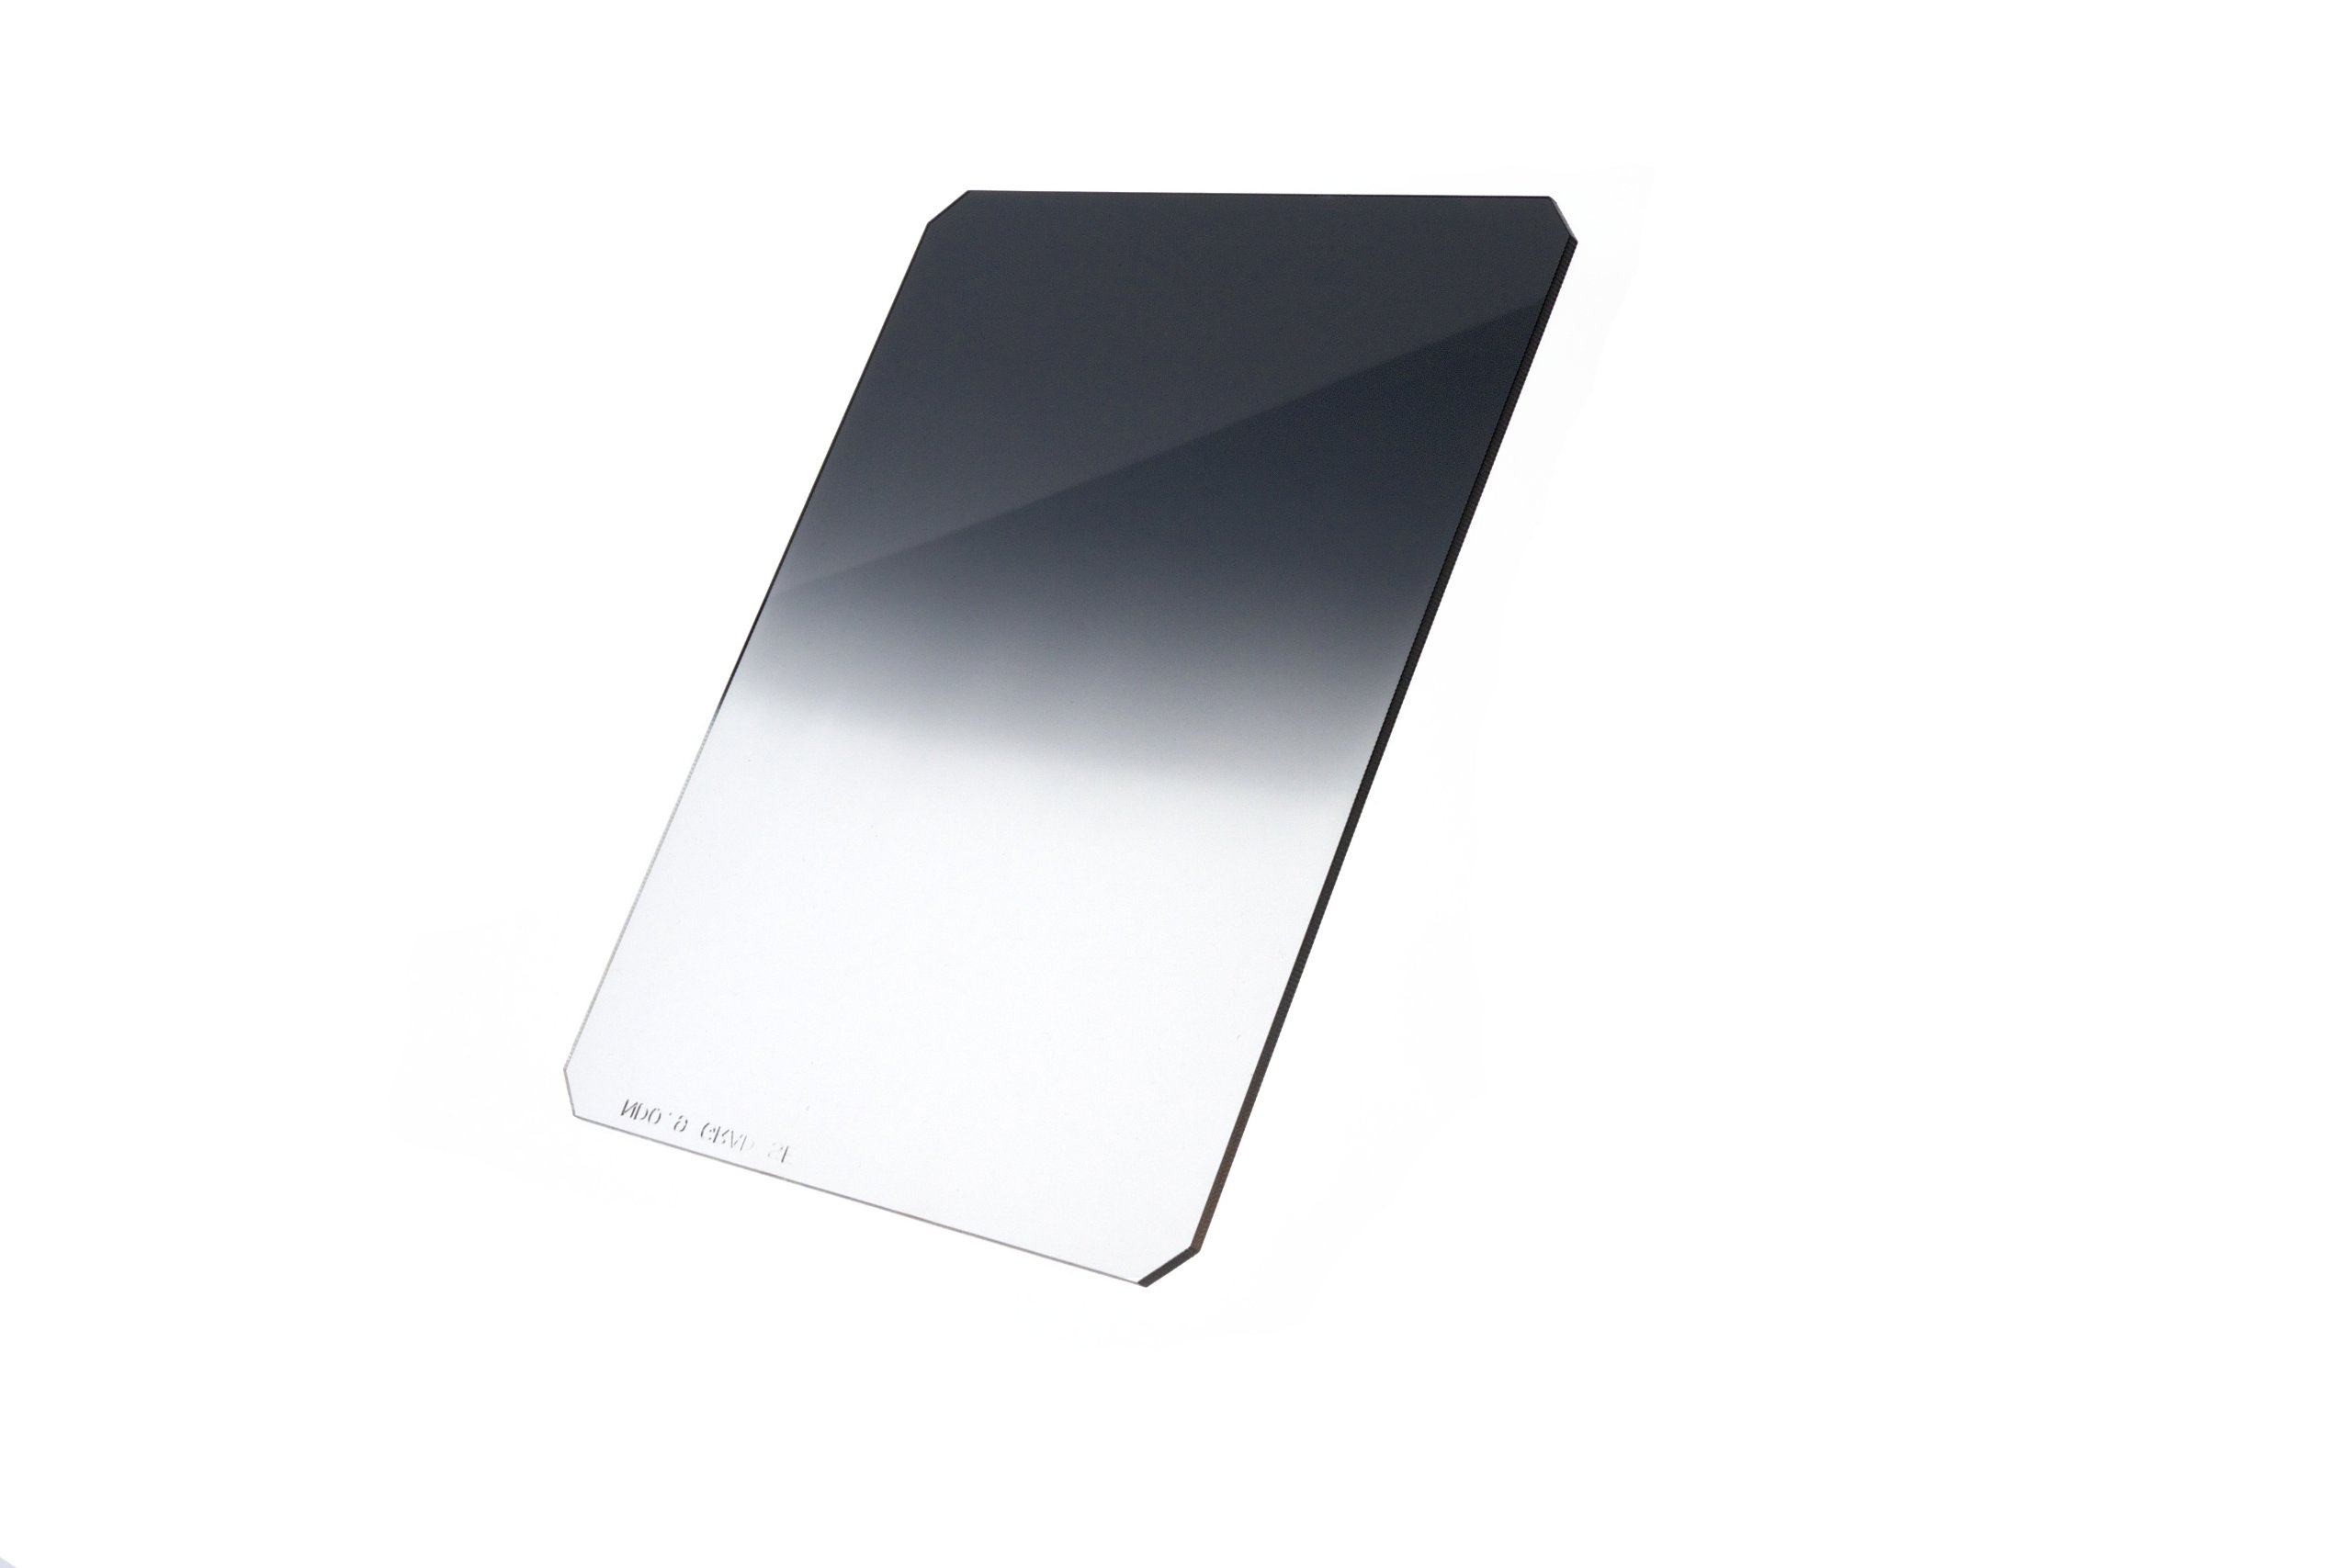 Formatt Hitech 85x110mm (3.35''x4.33'') Neutral Density Soft Edge Grad 0.9 (3 Stops) for Formatt Hitech 85mm modular holder Cokin P System compatible with all 85mm holder systems